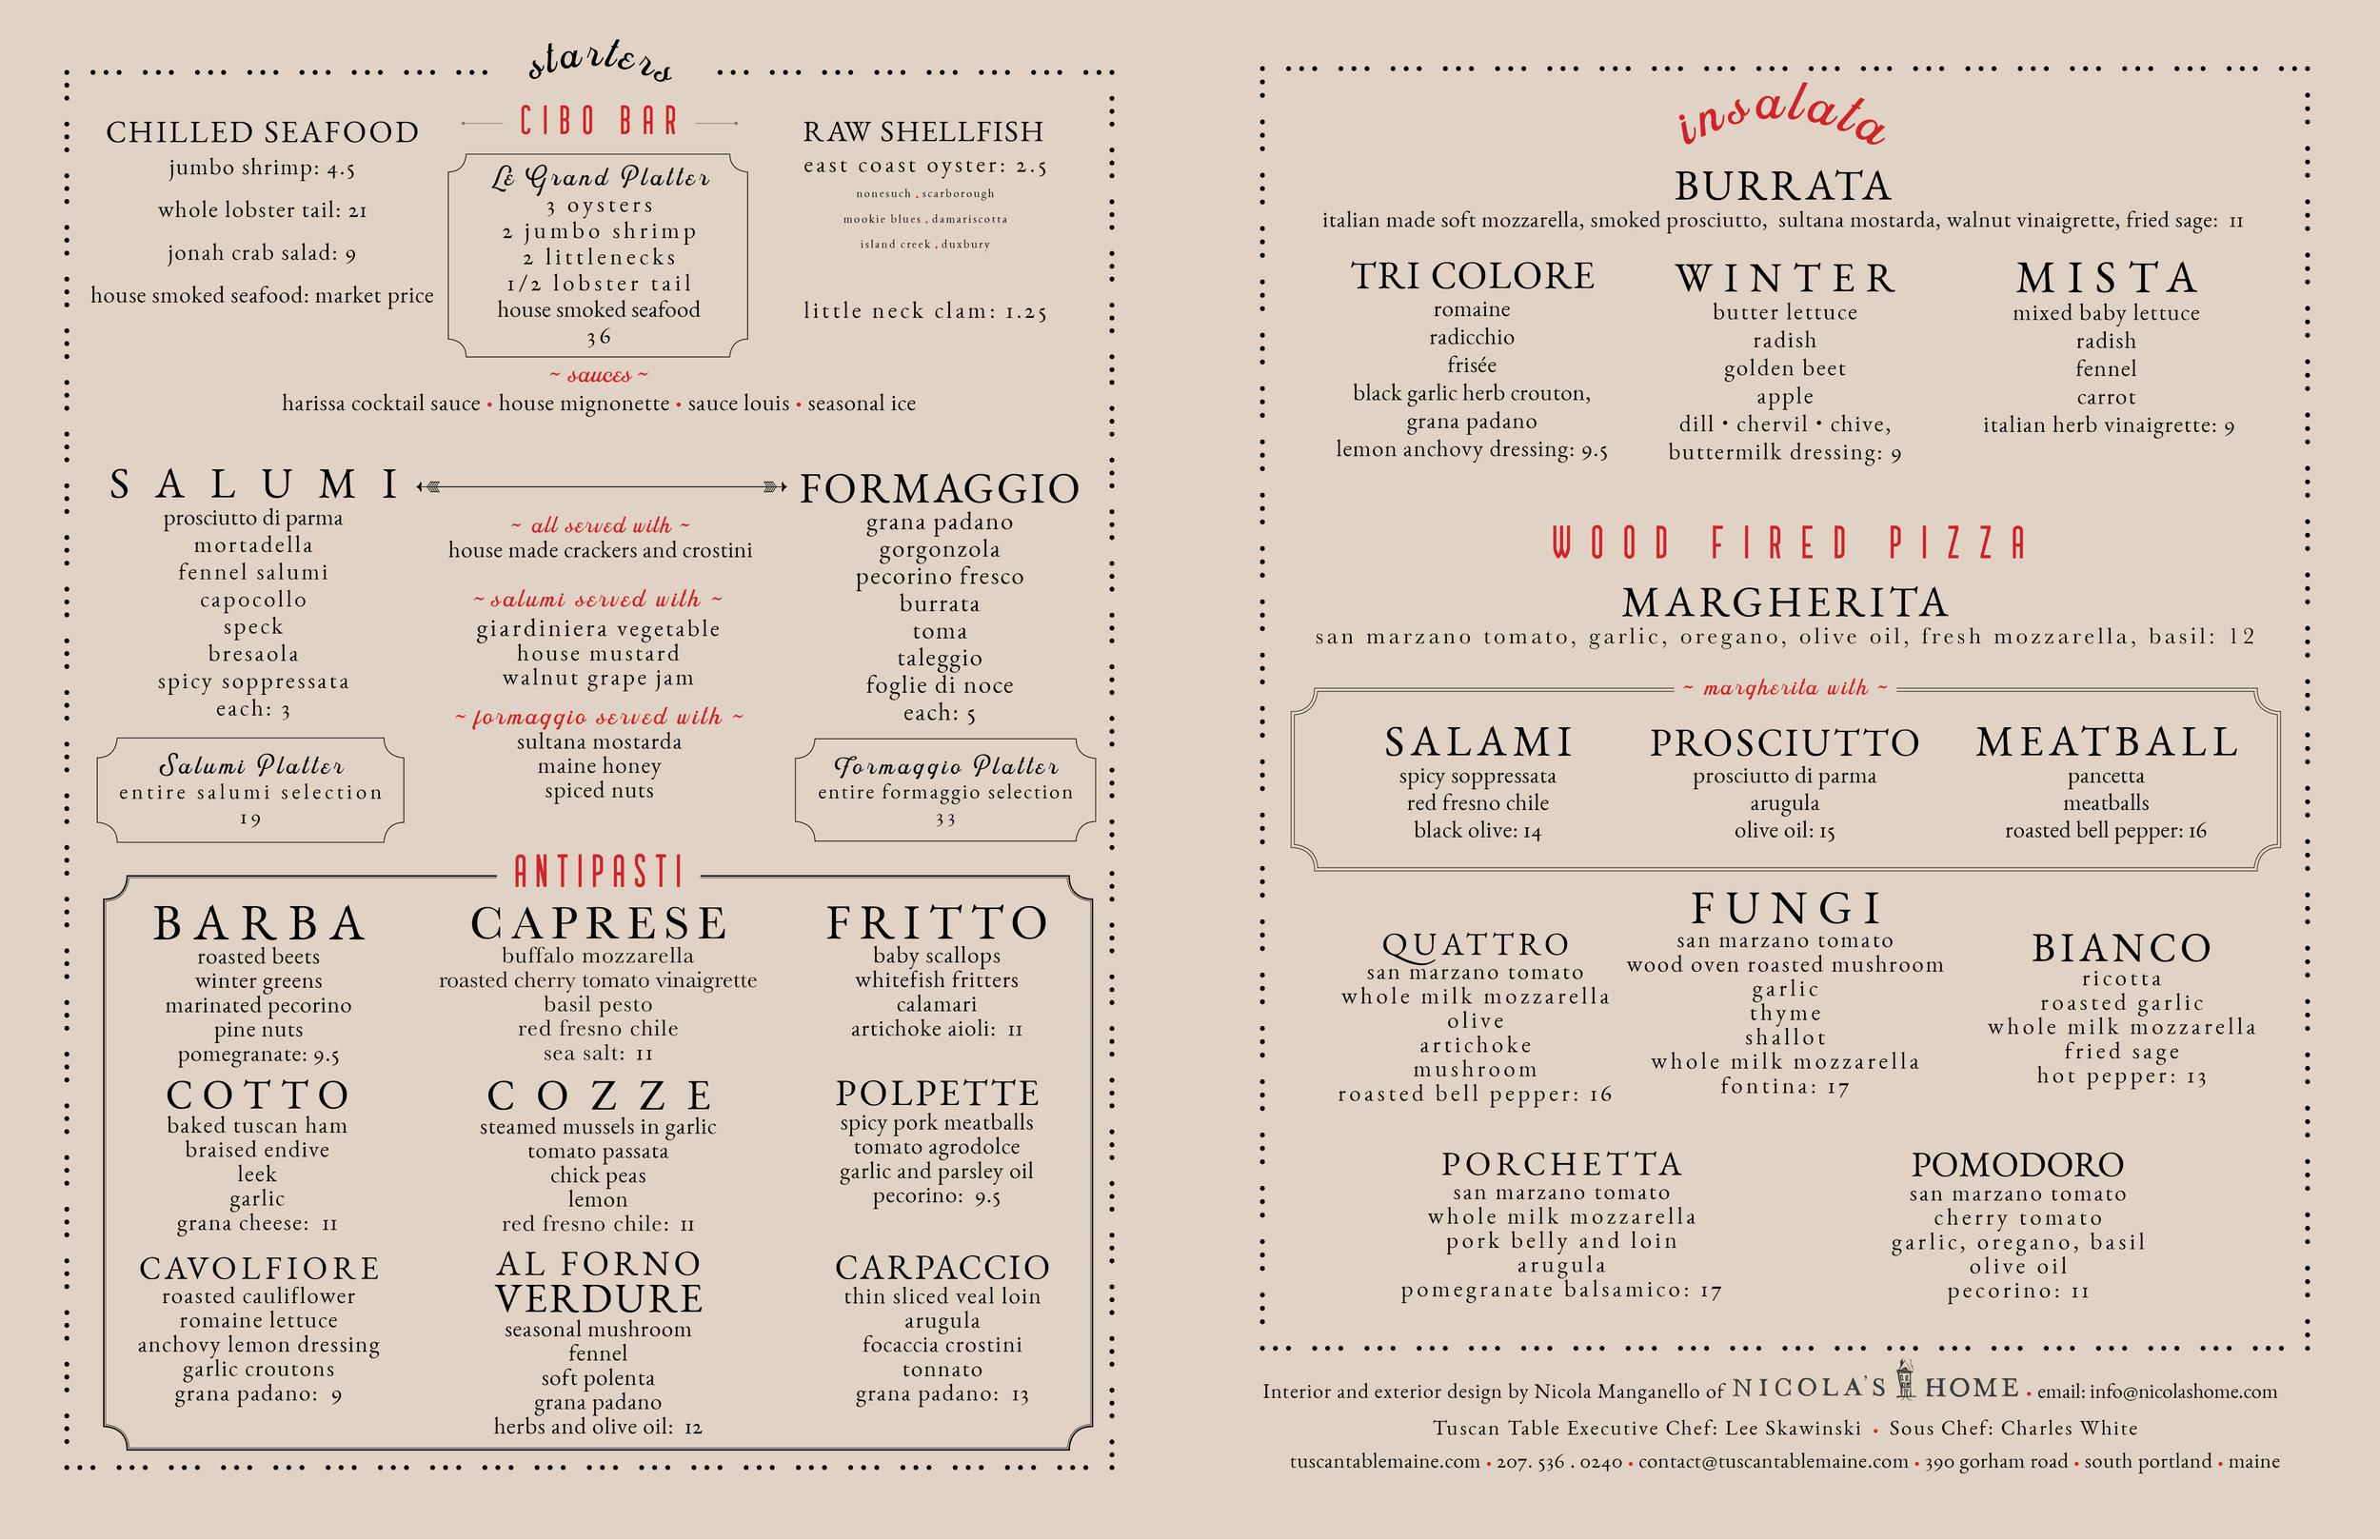 TT-lunch-menu-WEB-Image-12-292.jpg